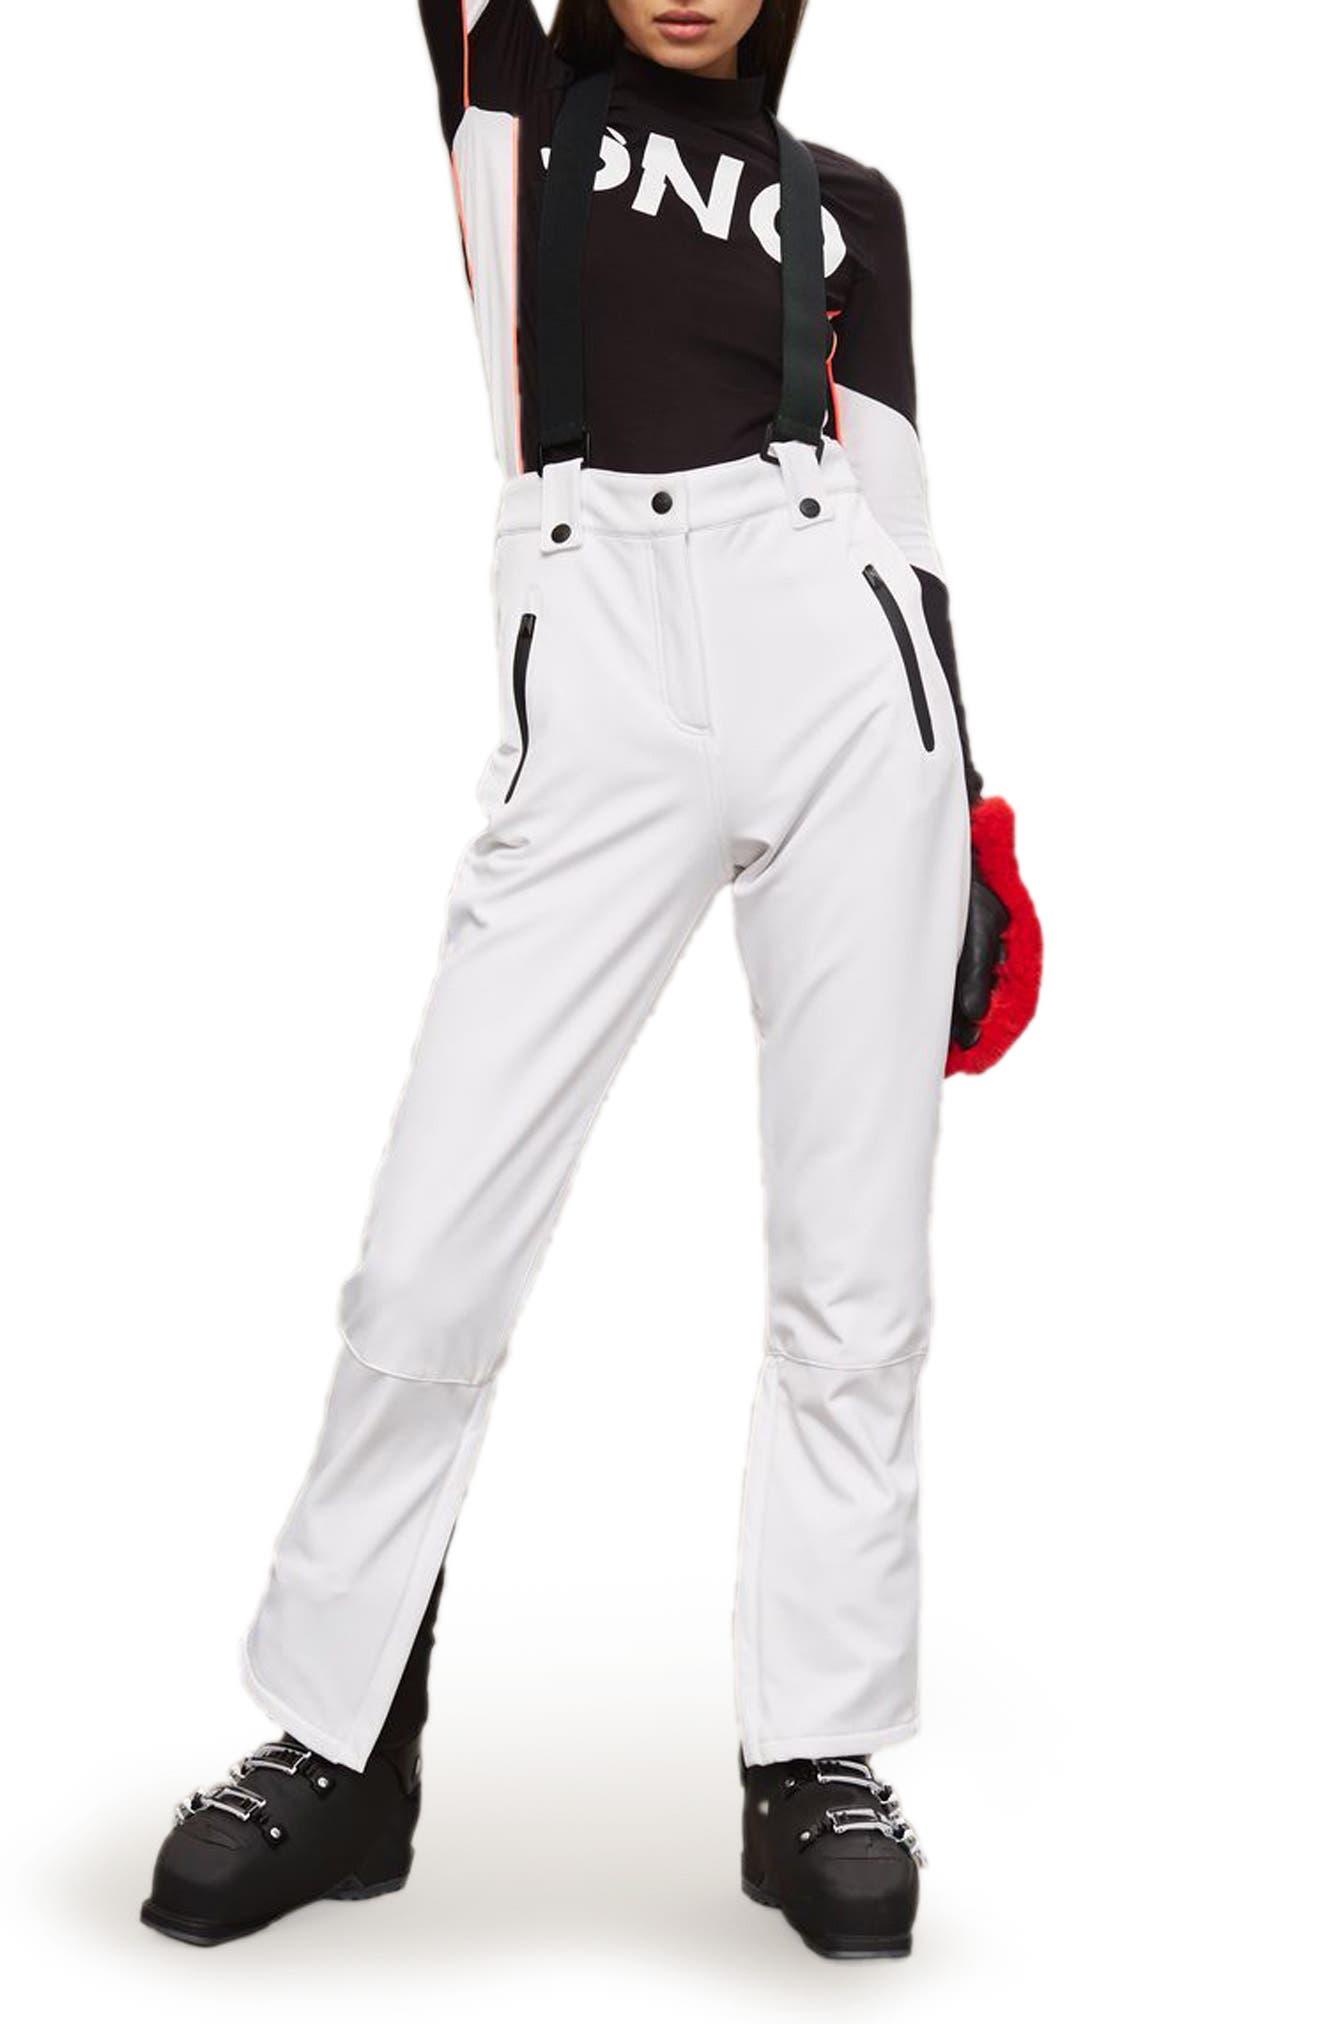 Topshop SNO Ace Suspender Ski Pants